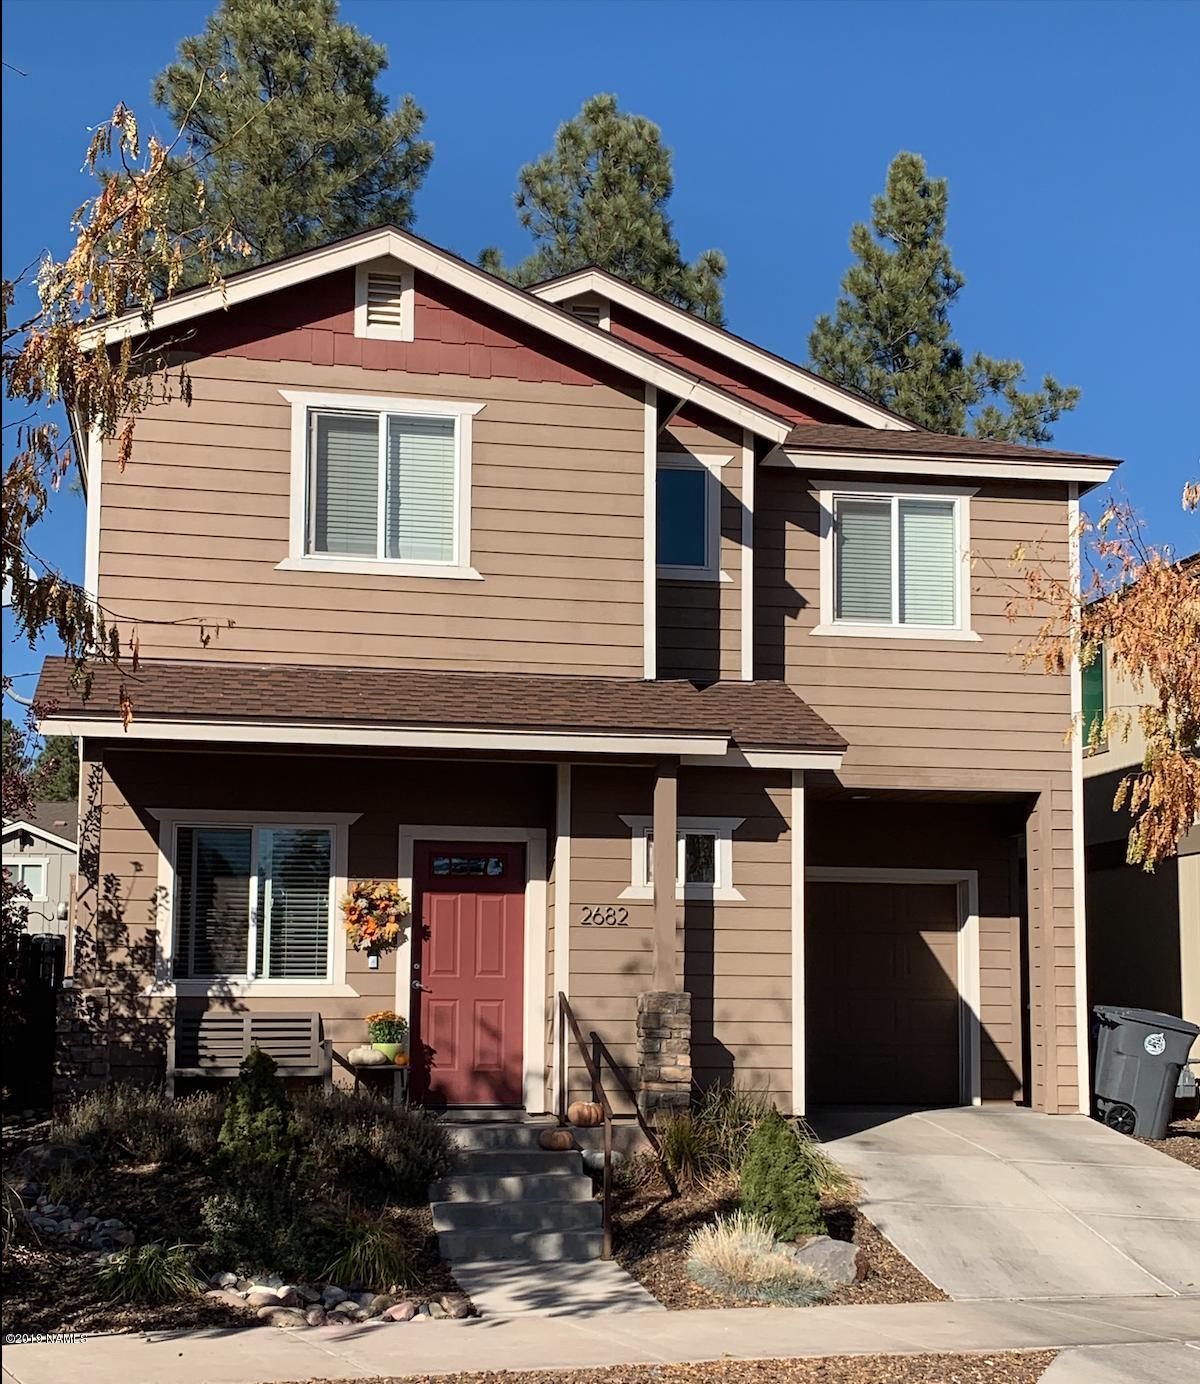 2682 W Jaclyn Drive, Flagstaff, AZ 86001